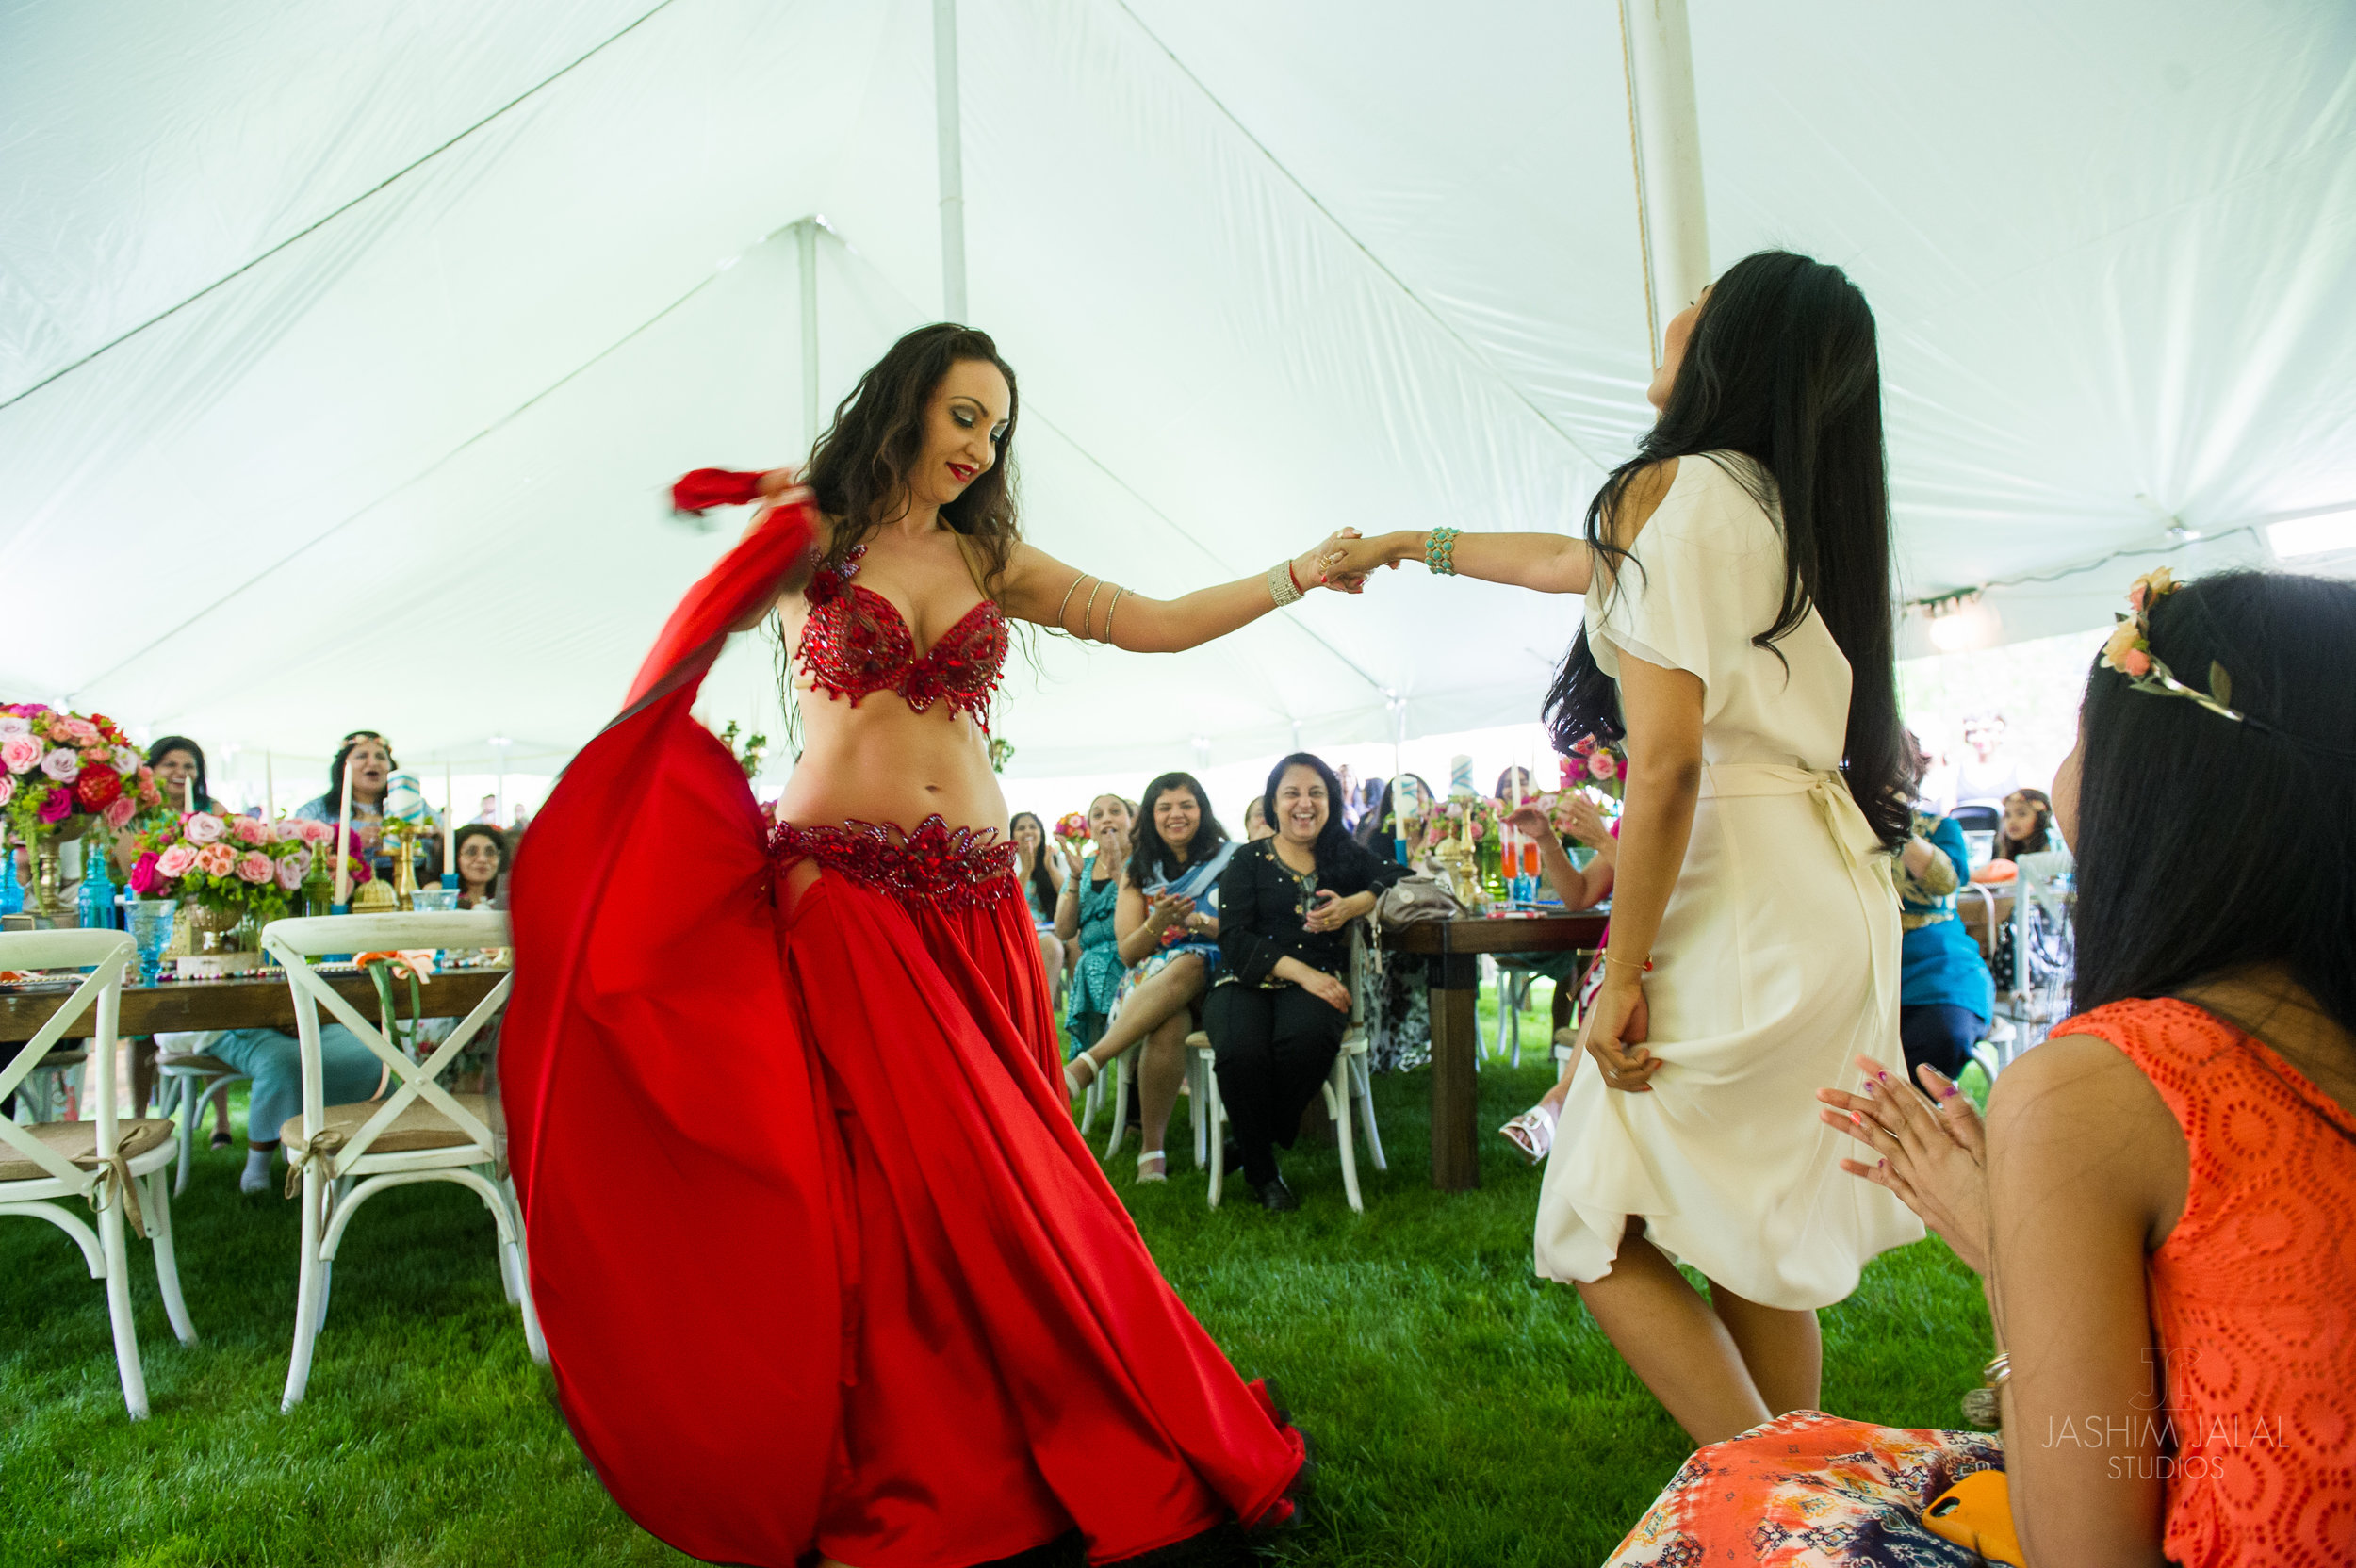 Indian Bridal Shower Boho Chic Summer Tent Event with Dancer (8).JPG